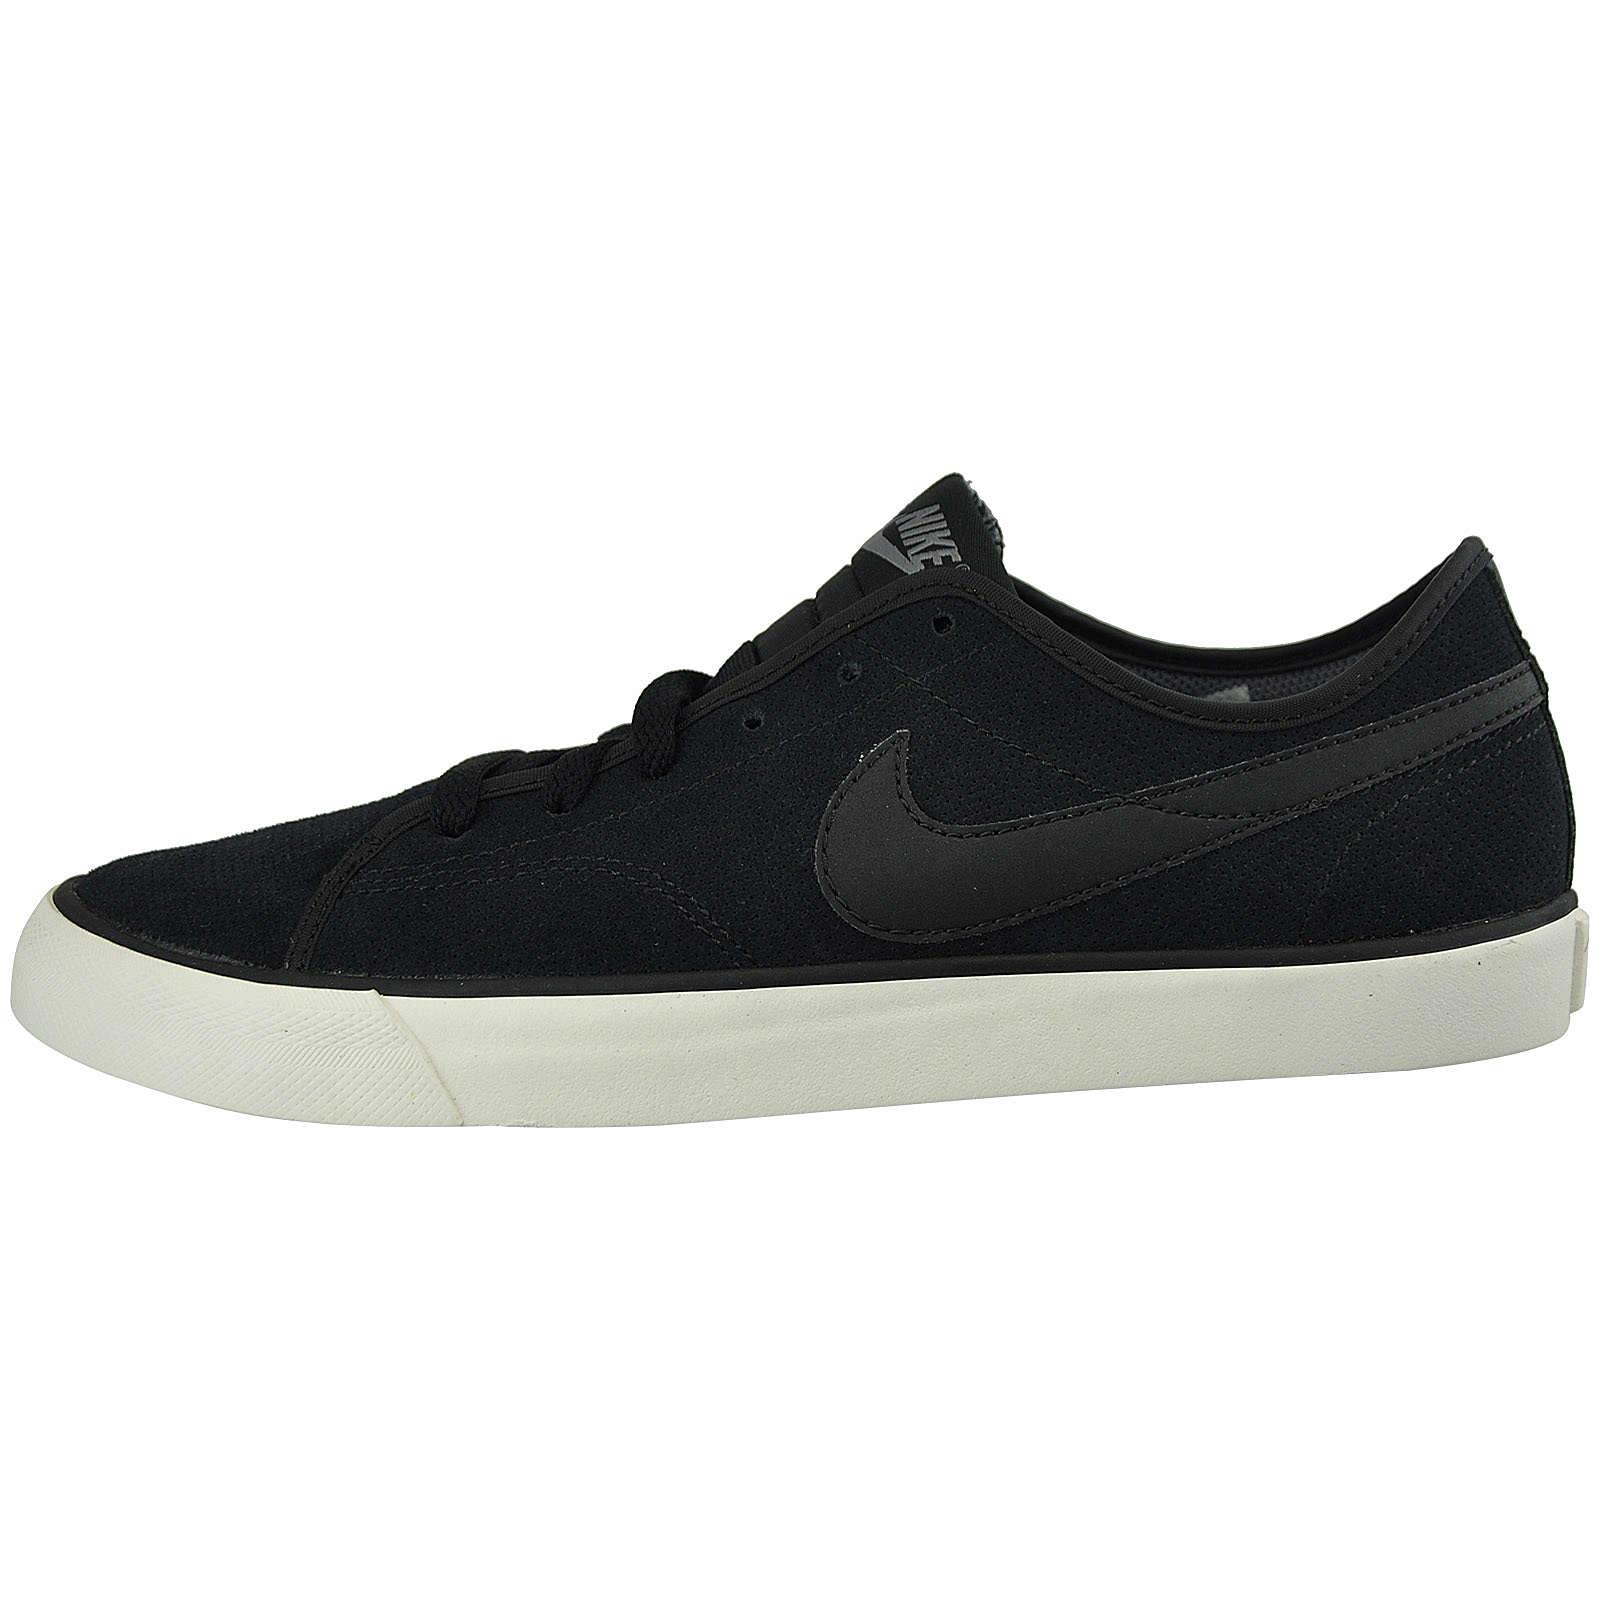 Nike Primo Court Leather Shoe 644826-005 Sneakers Low schwarz Herren Gr. 39